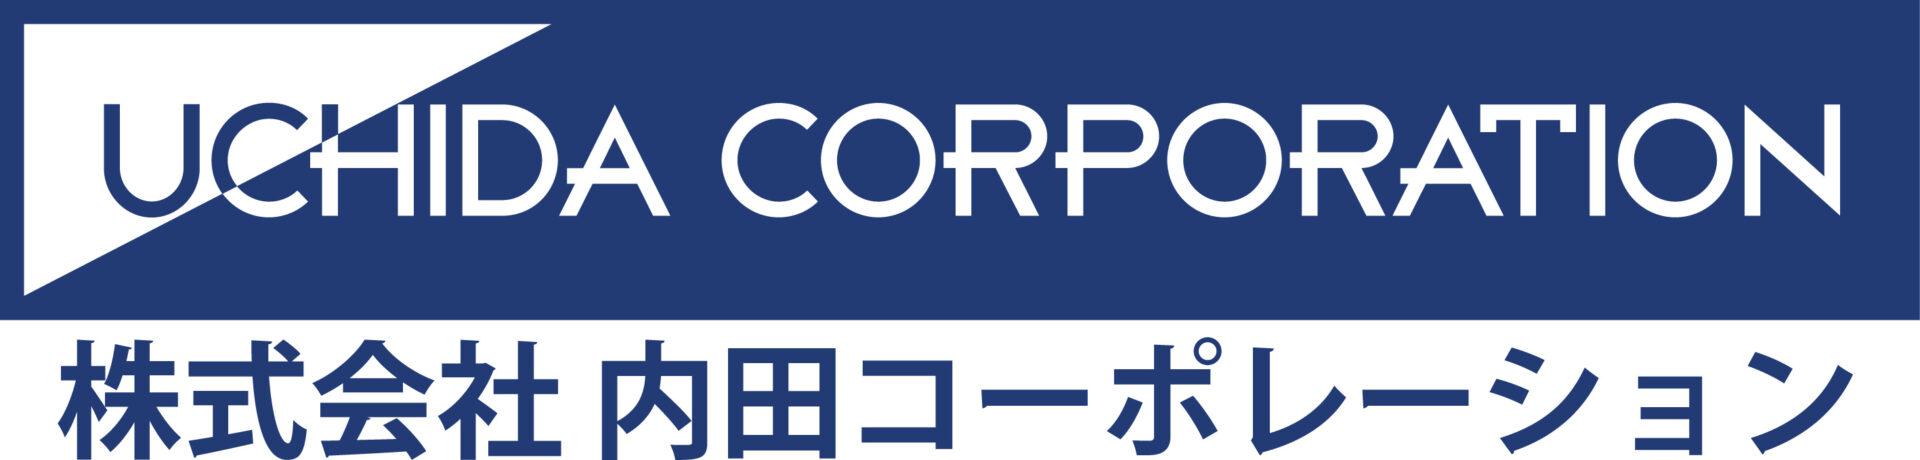 Uchida Corporation